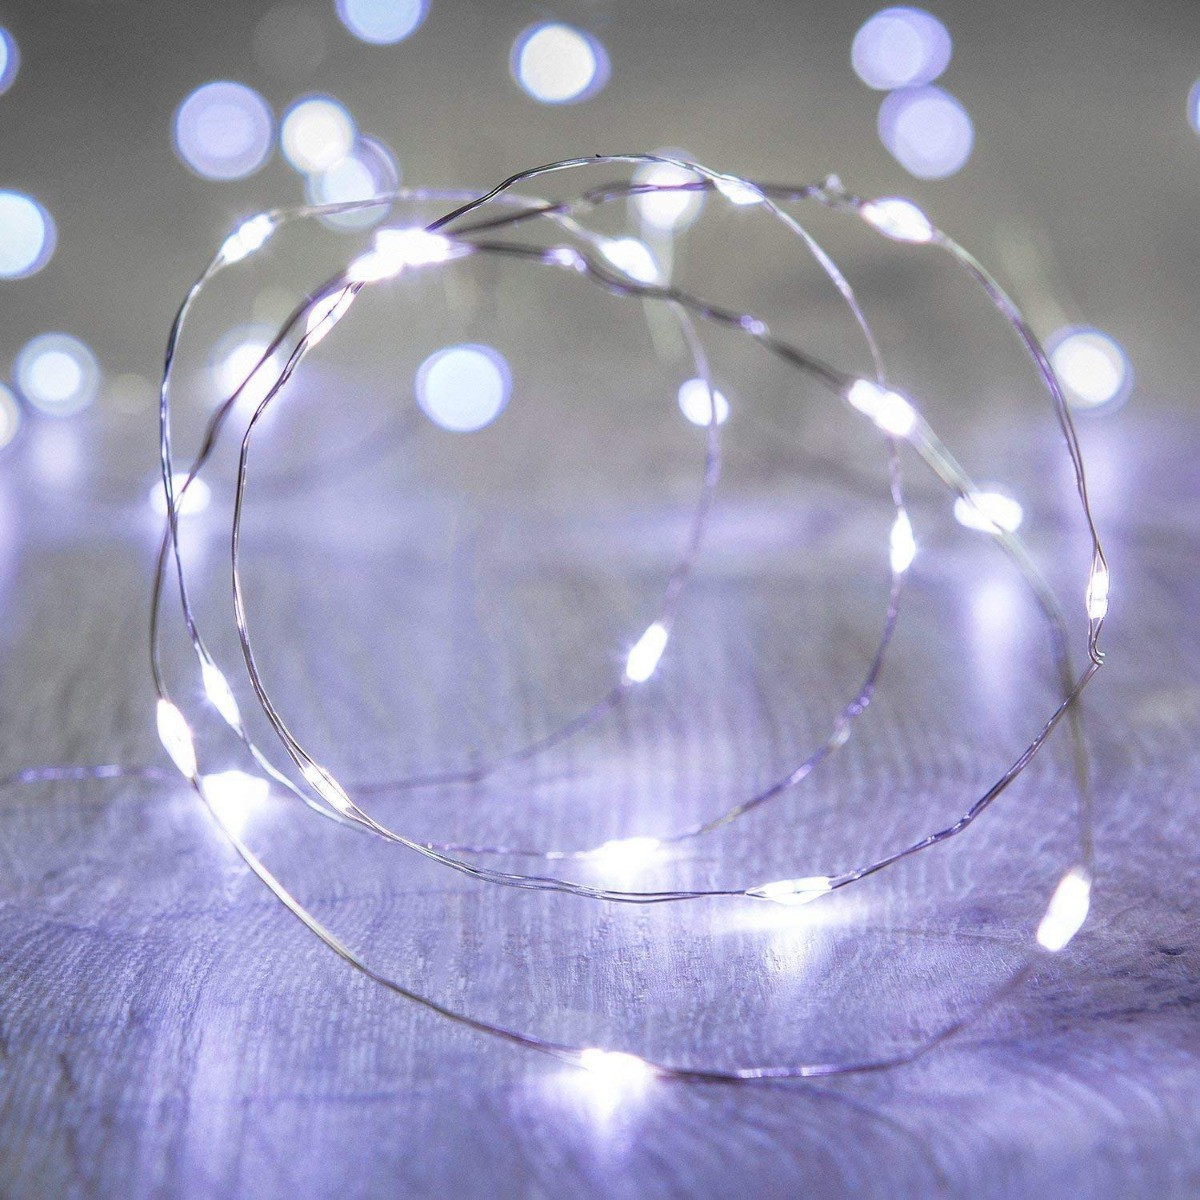 Svetelný drôtik s 20ks LED lampami na batérie studená biela farba svetla megamix.sk